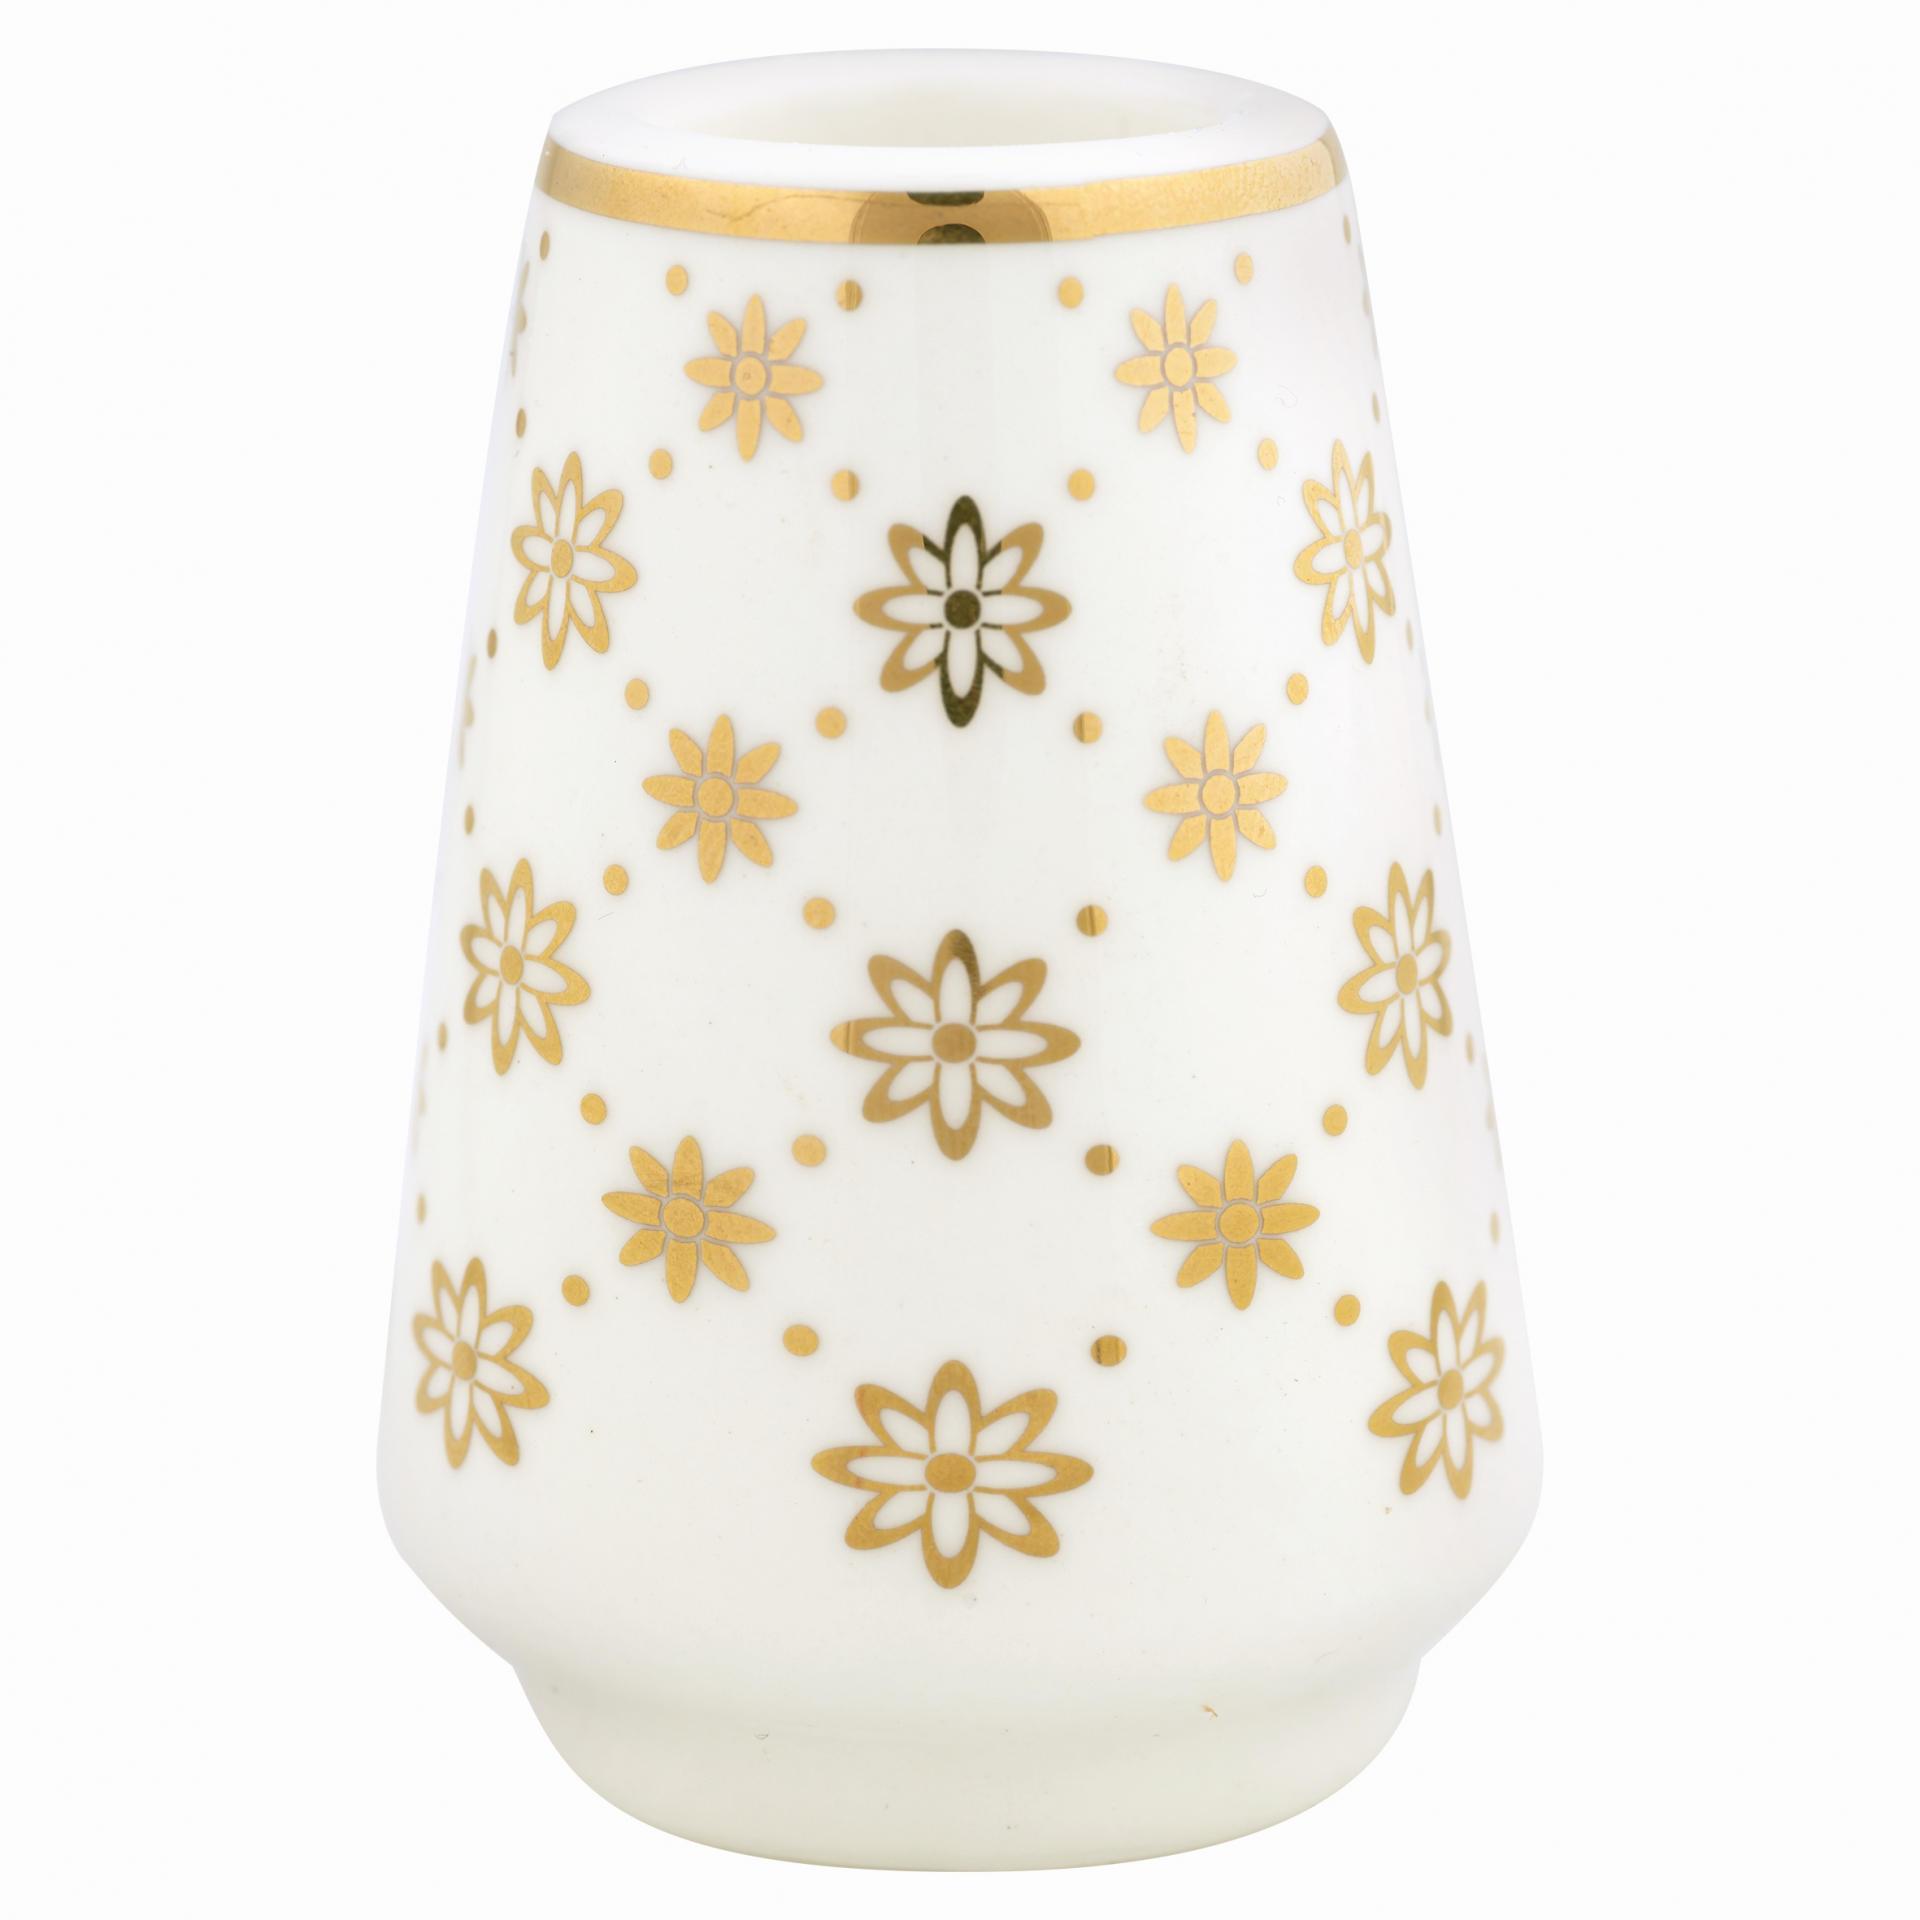 GREEN GATE Keramický svícínek Laurie gold, bílá barva, zlatá barva, keramika